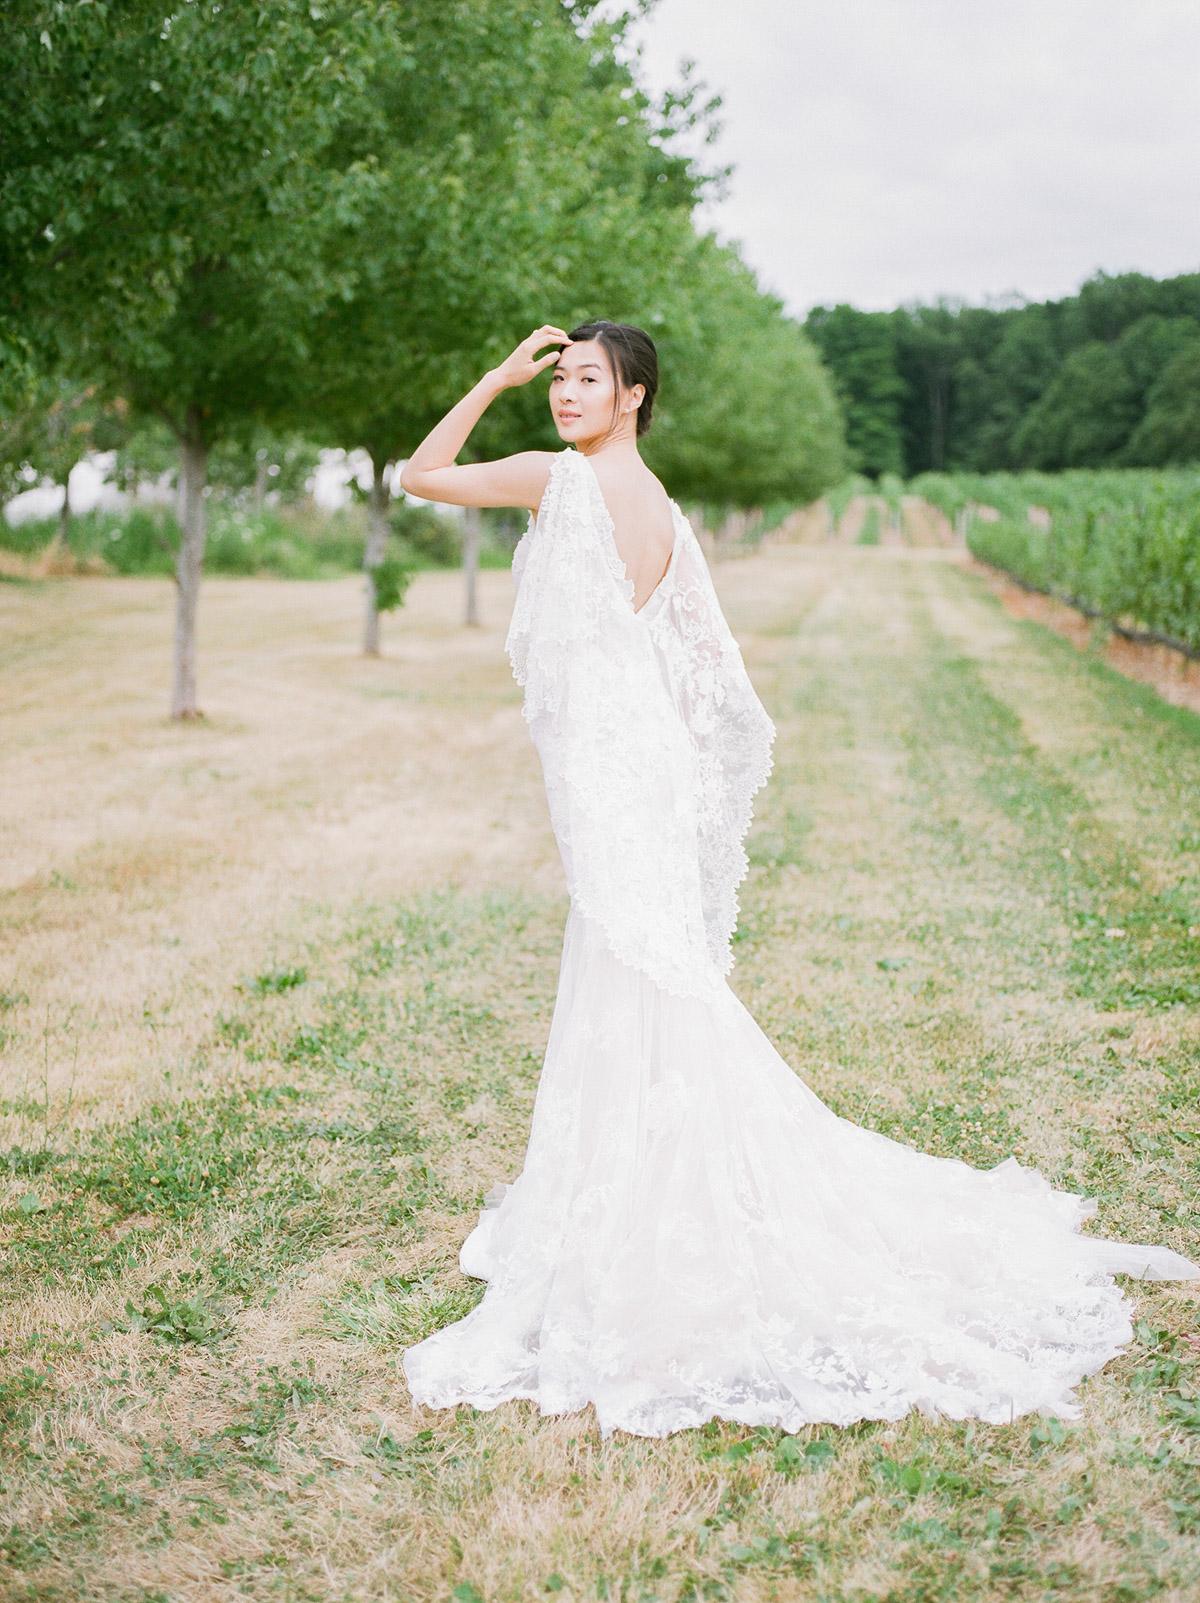 jennifer-xu-photography-vineyard-bride-swish-list-rosewod-eatstes-winery-beamsville-wedding-editorial-11.jpg